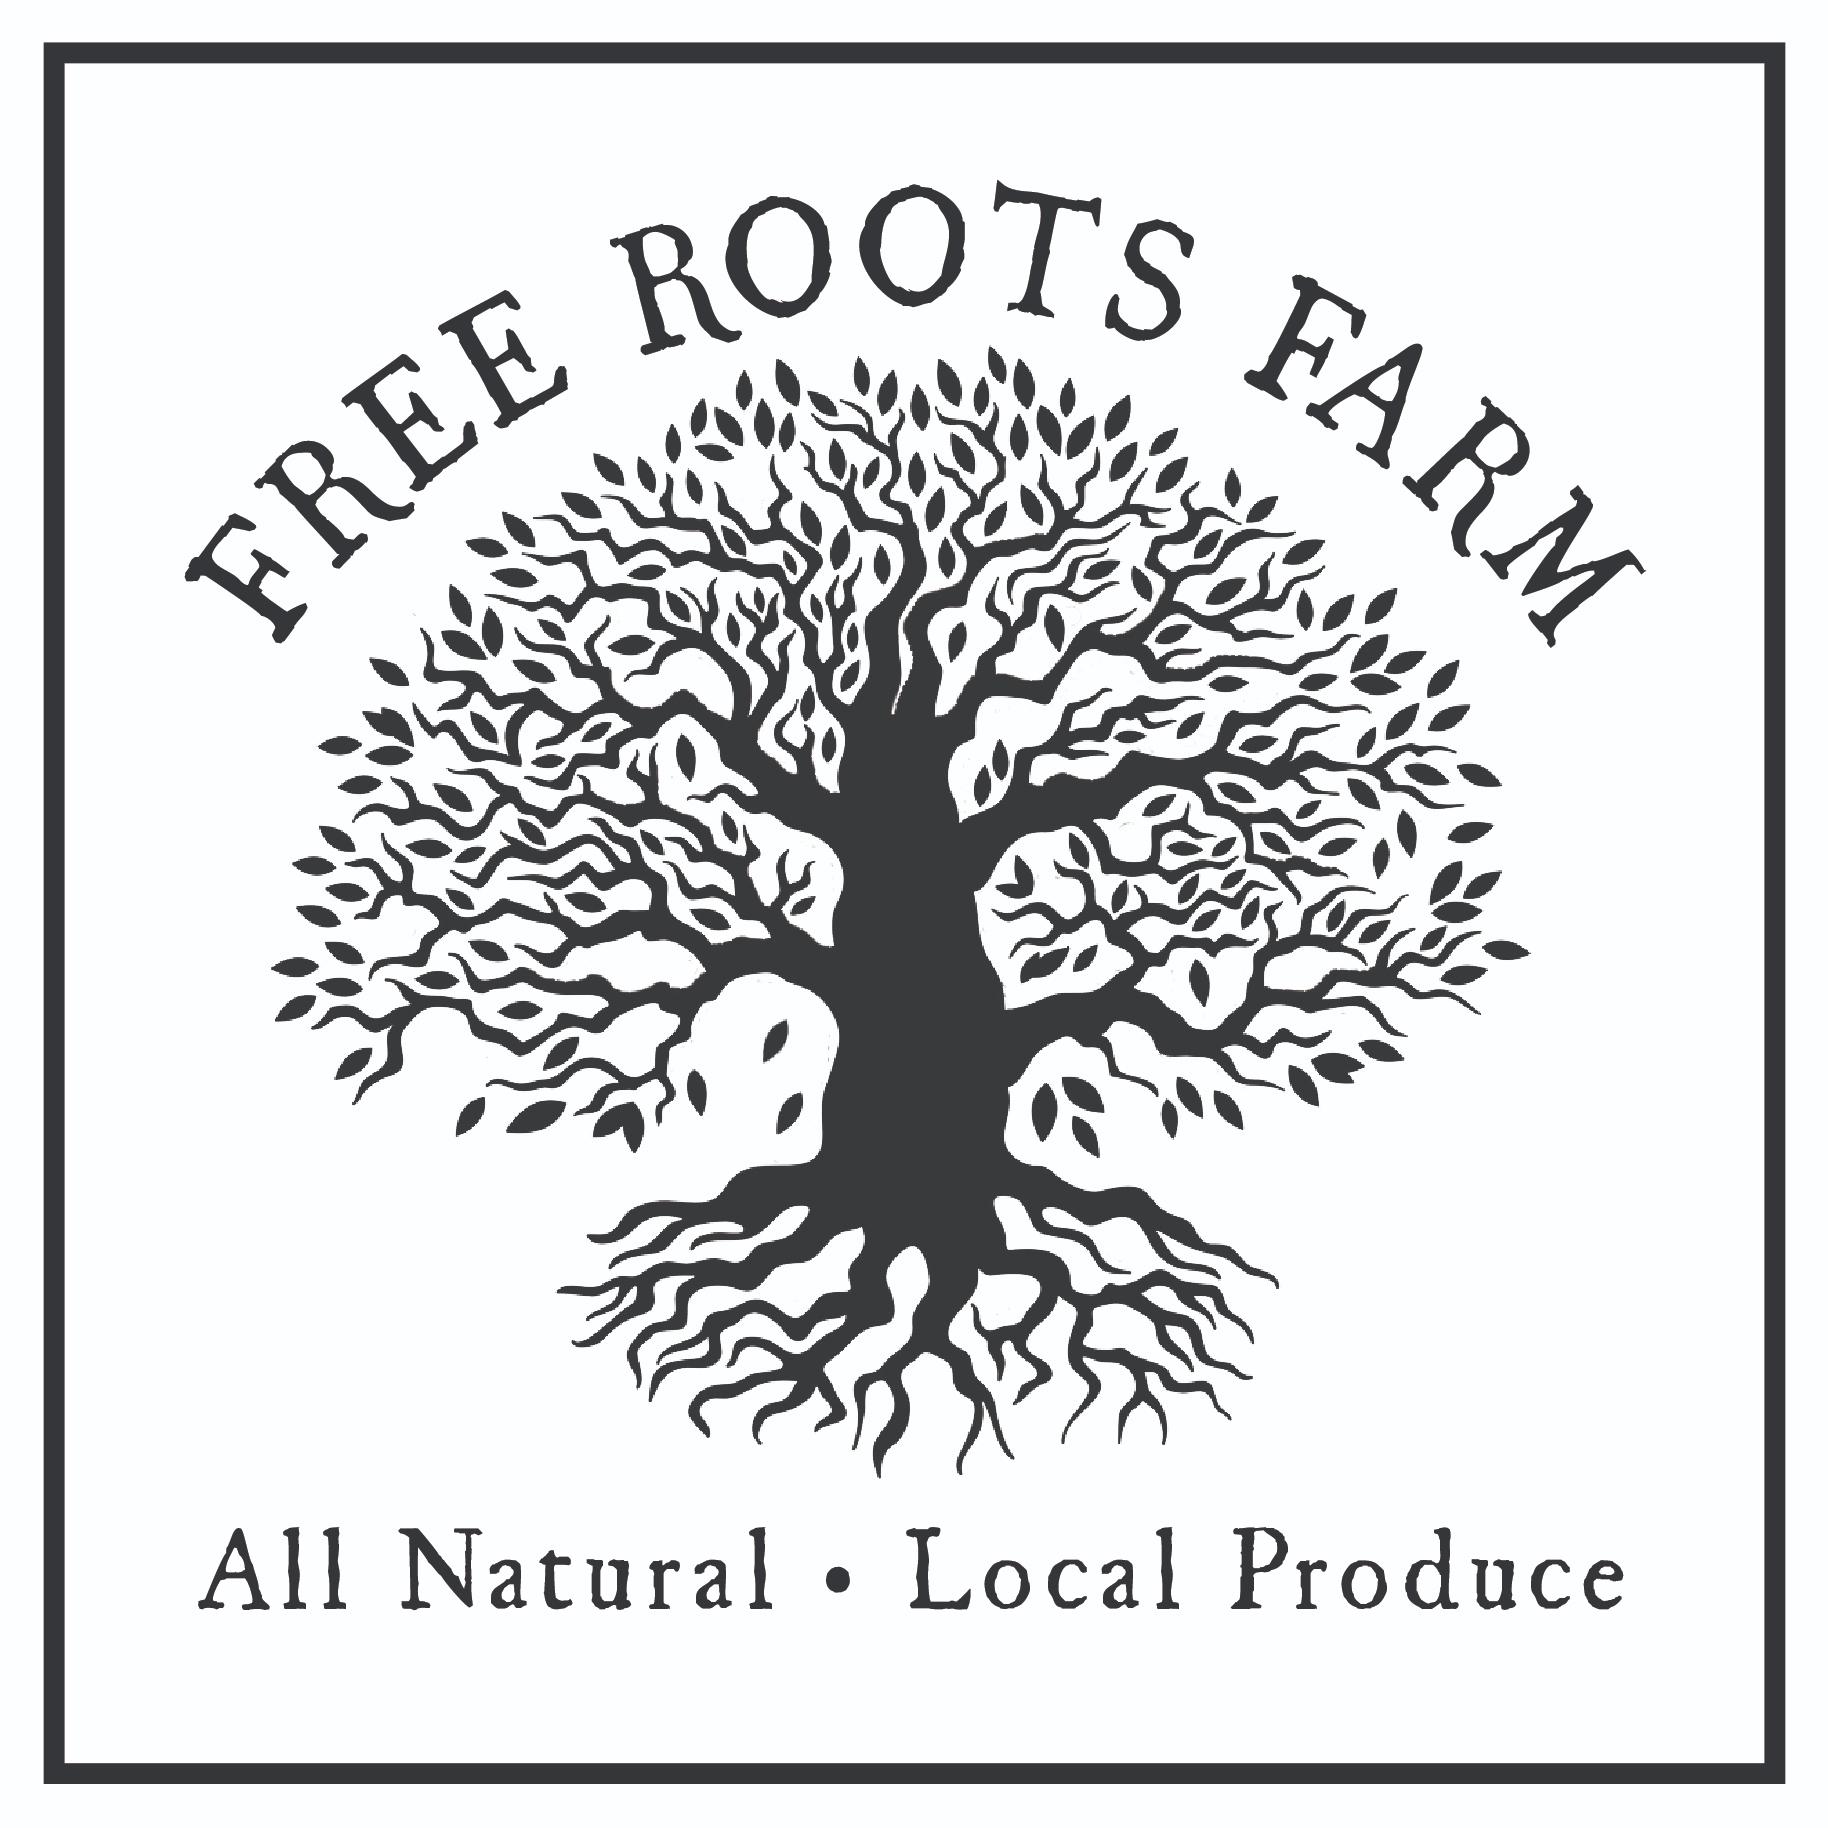 Free Roots Farm